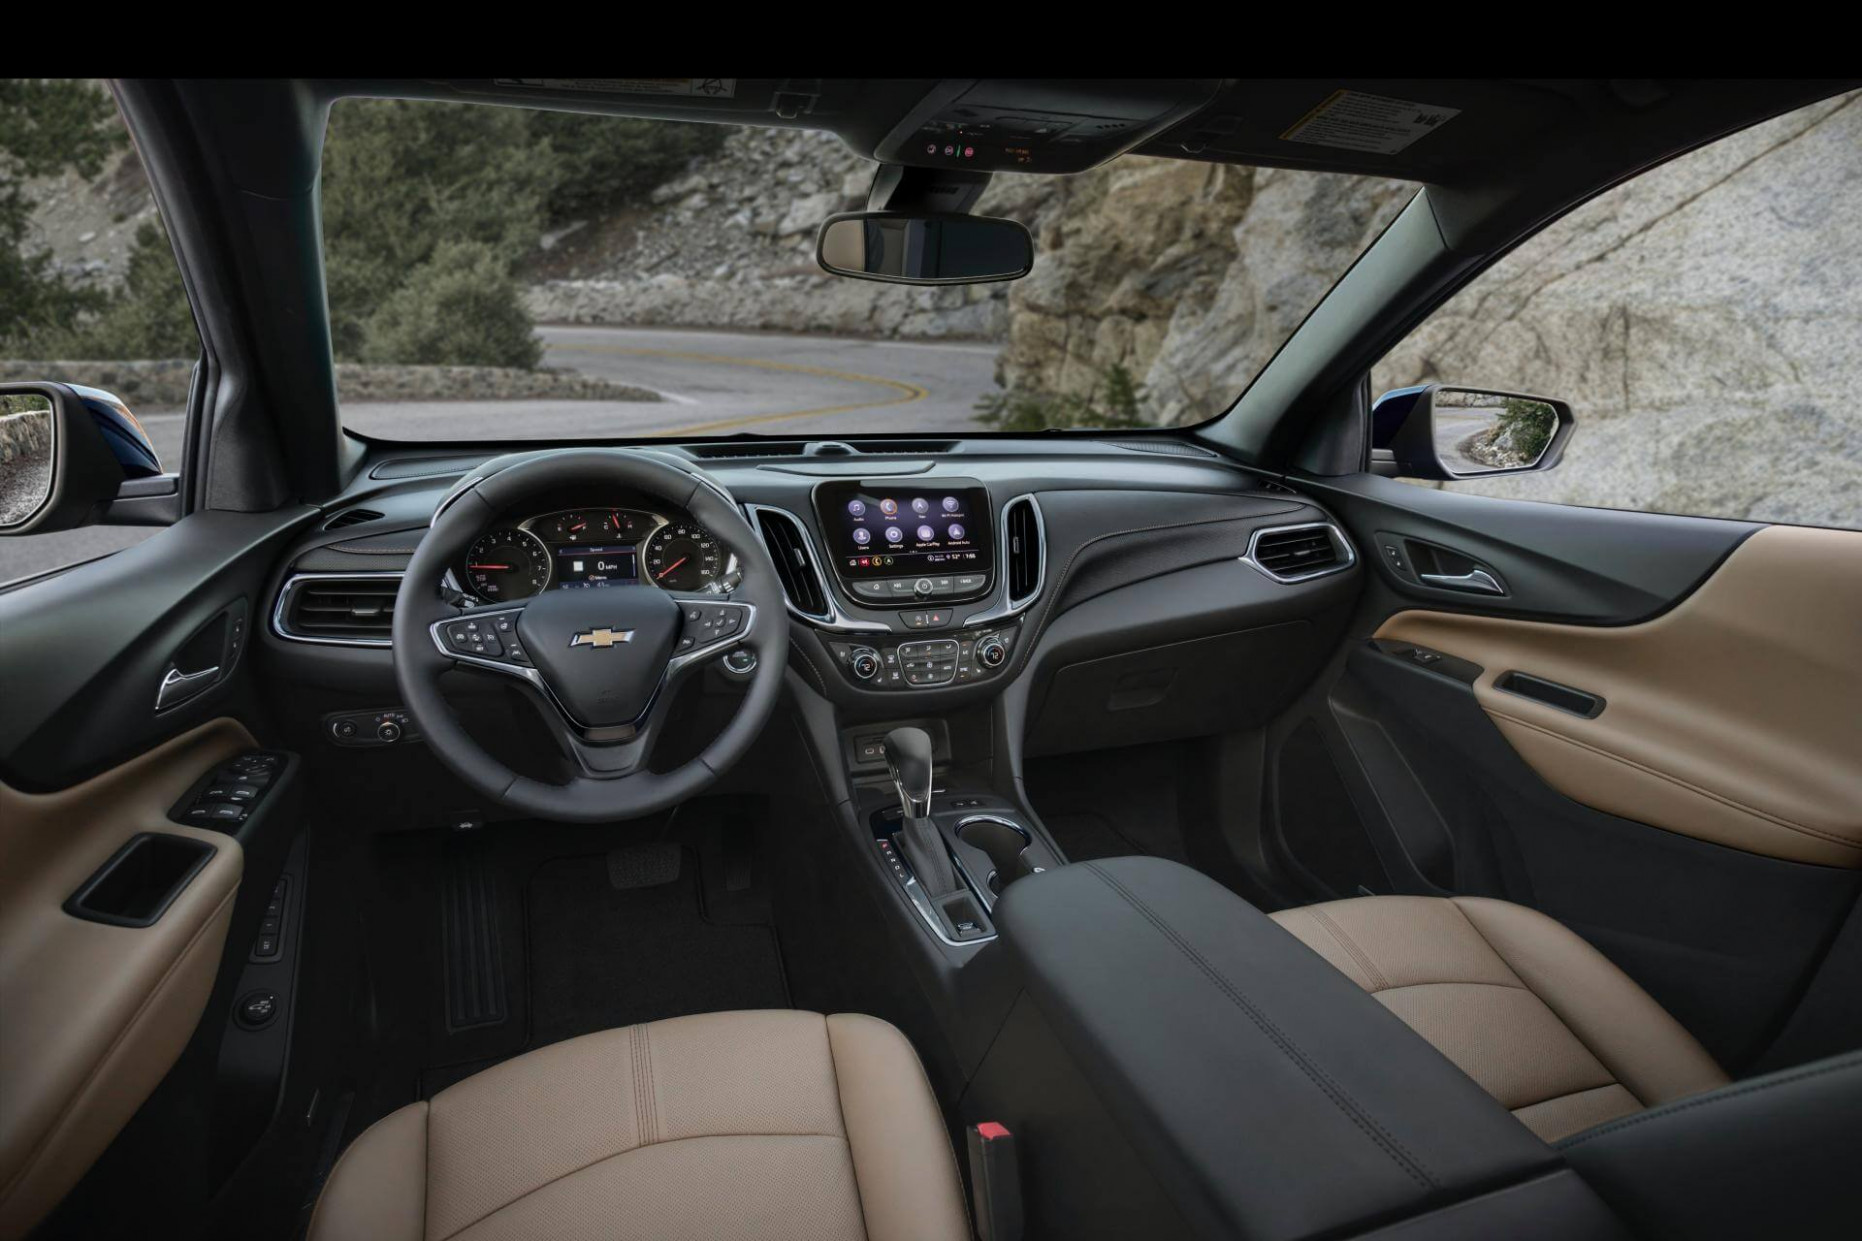 Specs 2022 Chevrolet Equinox